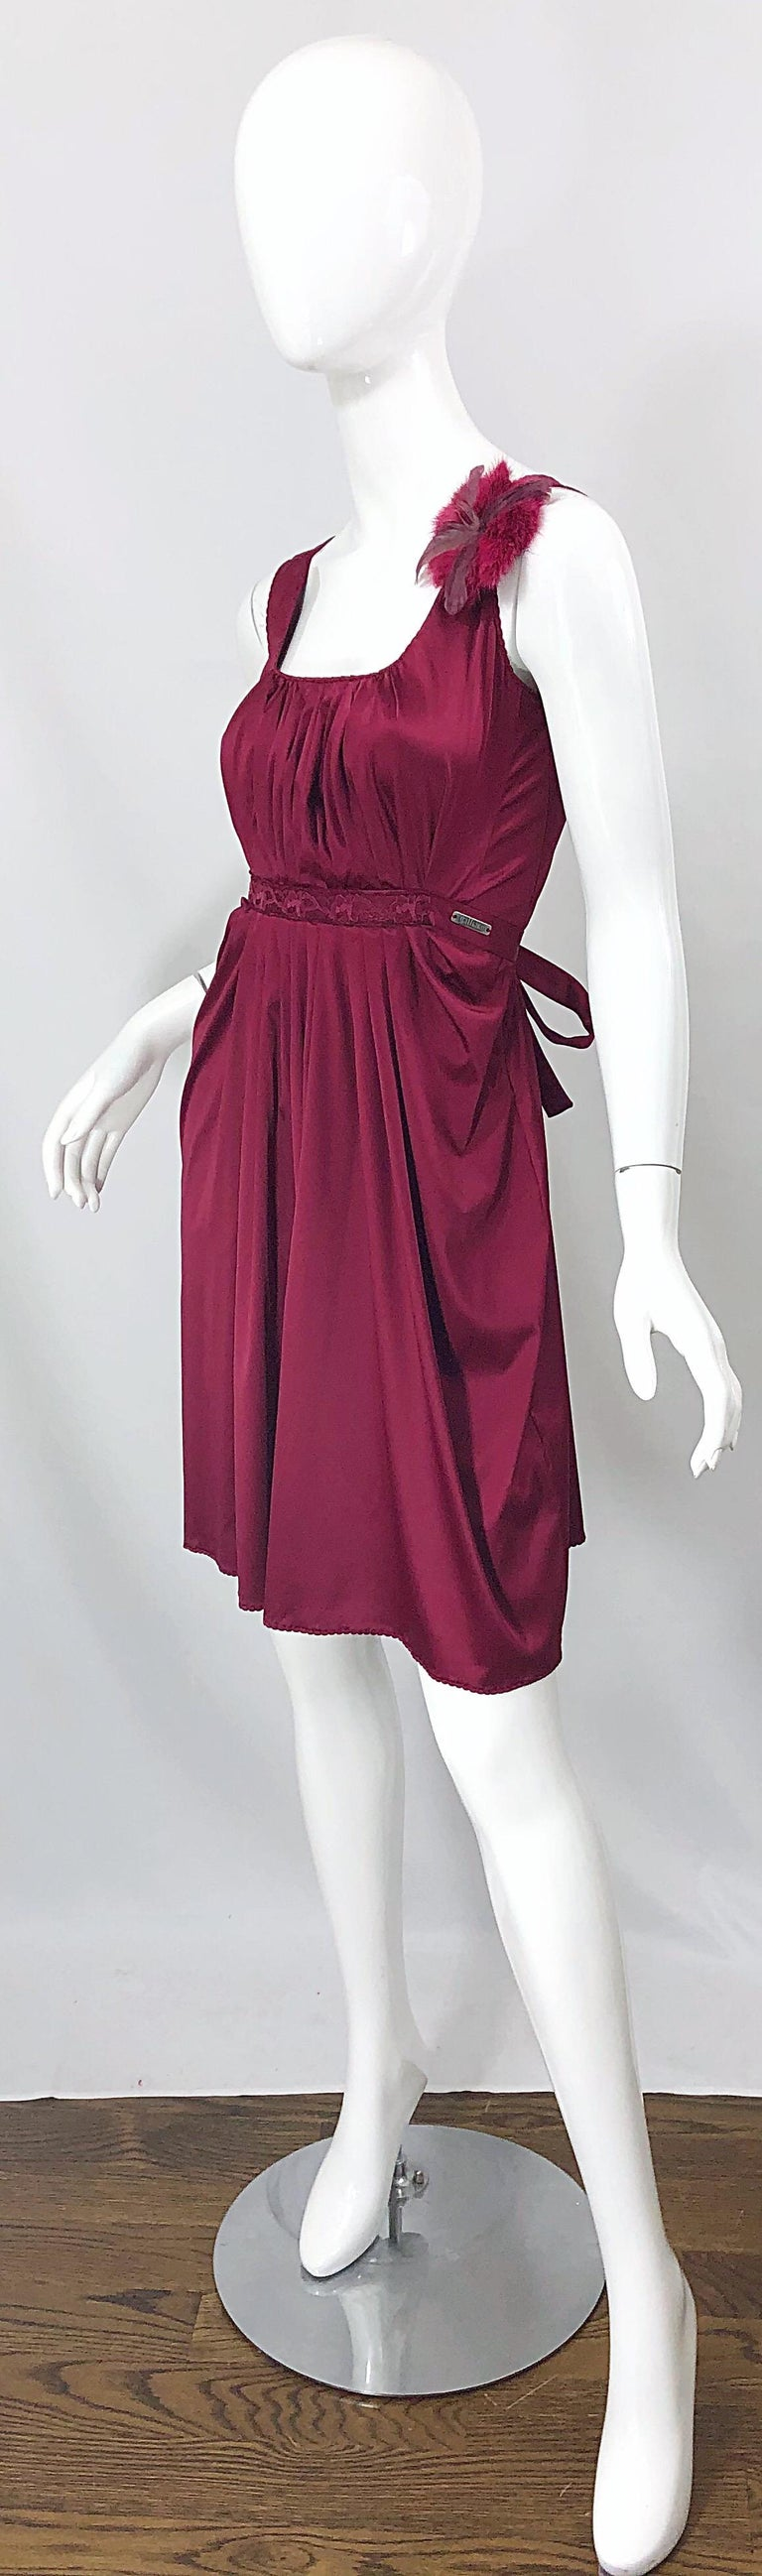 Women's 2000s John Galliano Sz 42 (US 6 / 8) Burgundy Silk Feather Brooch Babydoll Dress For Sale